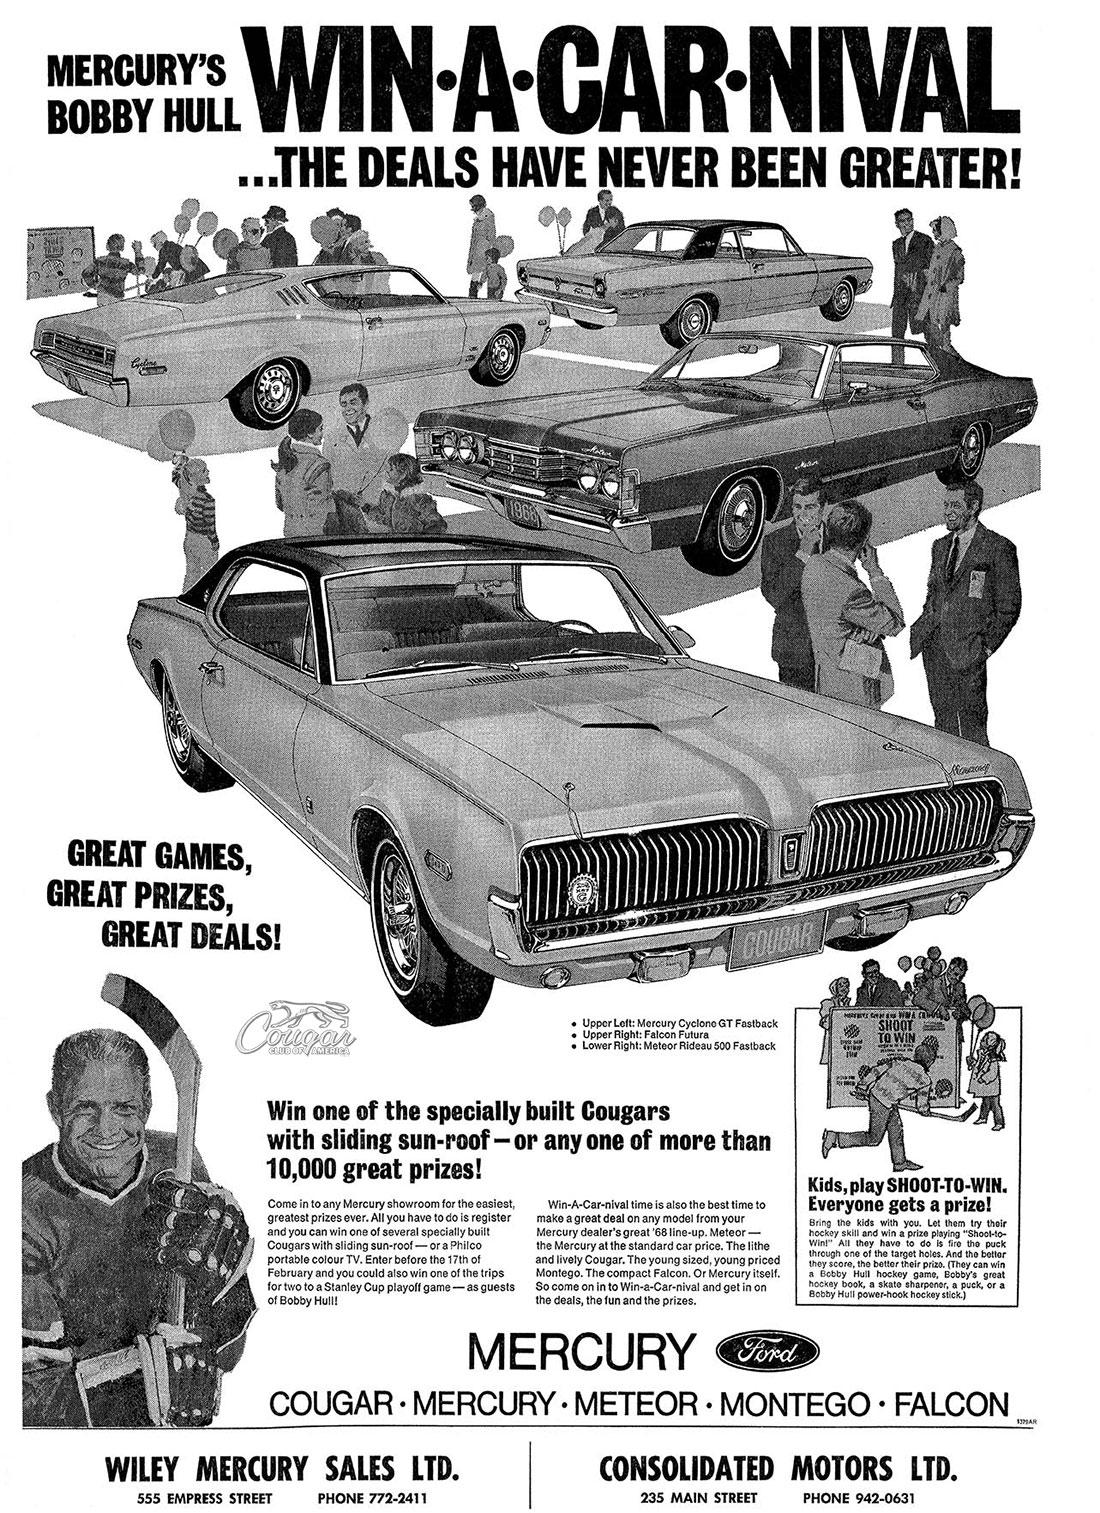 1968 Mercury Cougar XR7-G Ad Win A Car-nival